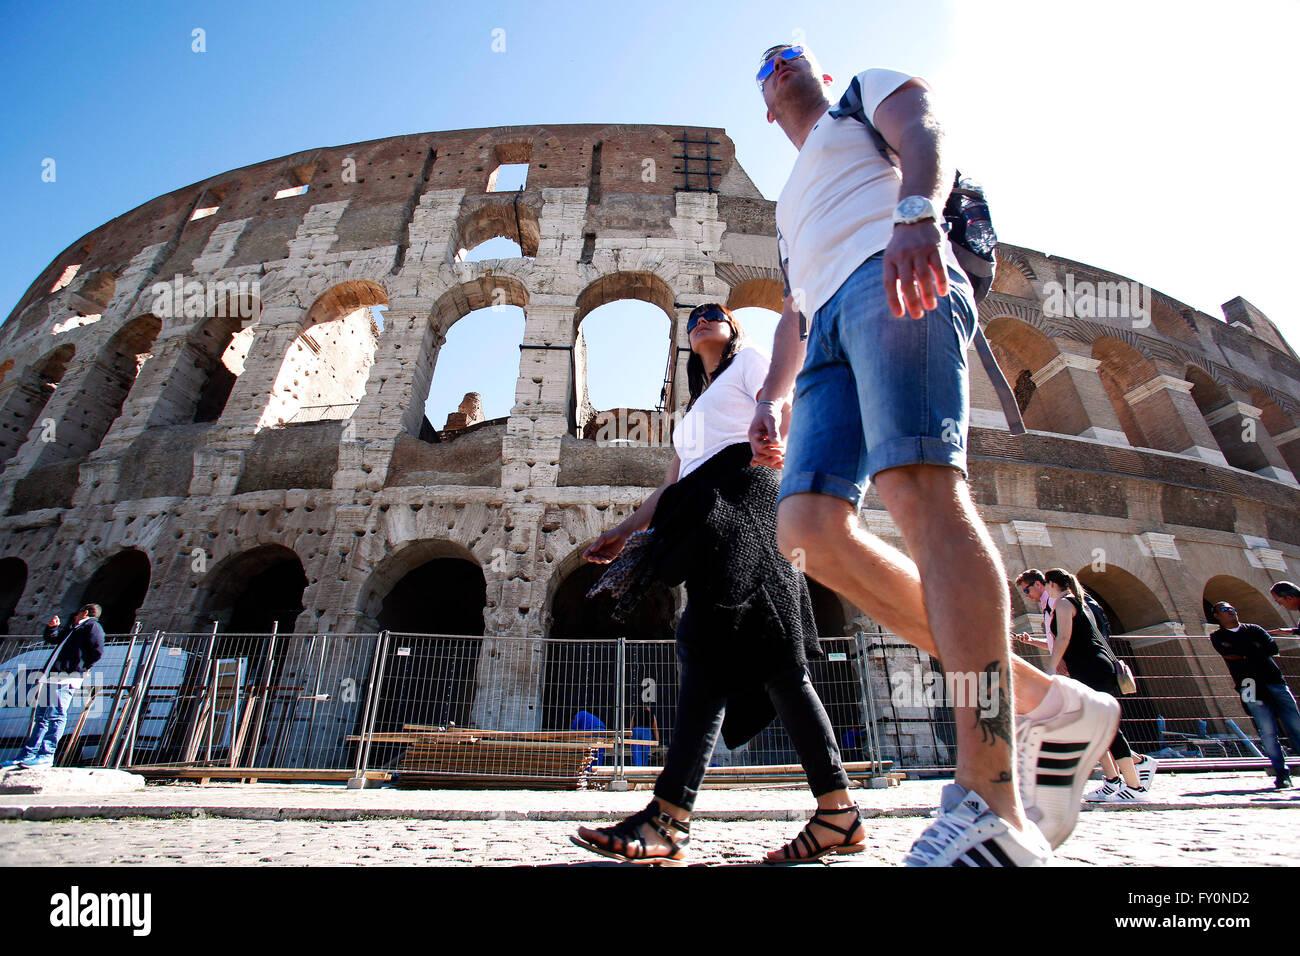 Tourists at Coliseum Rome 20th April 2016. Around Coliseum Photo Samantha Zucchi Insidefoto - Stock Image